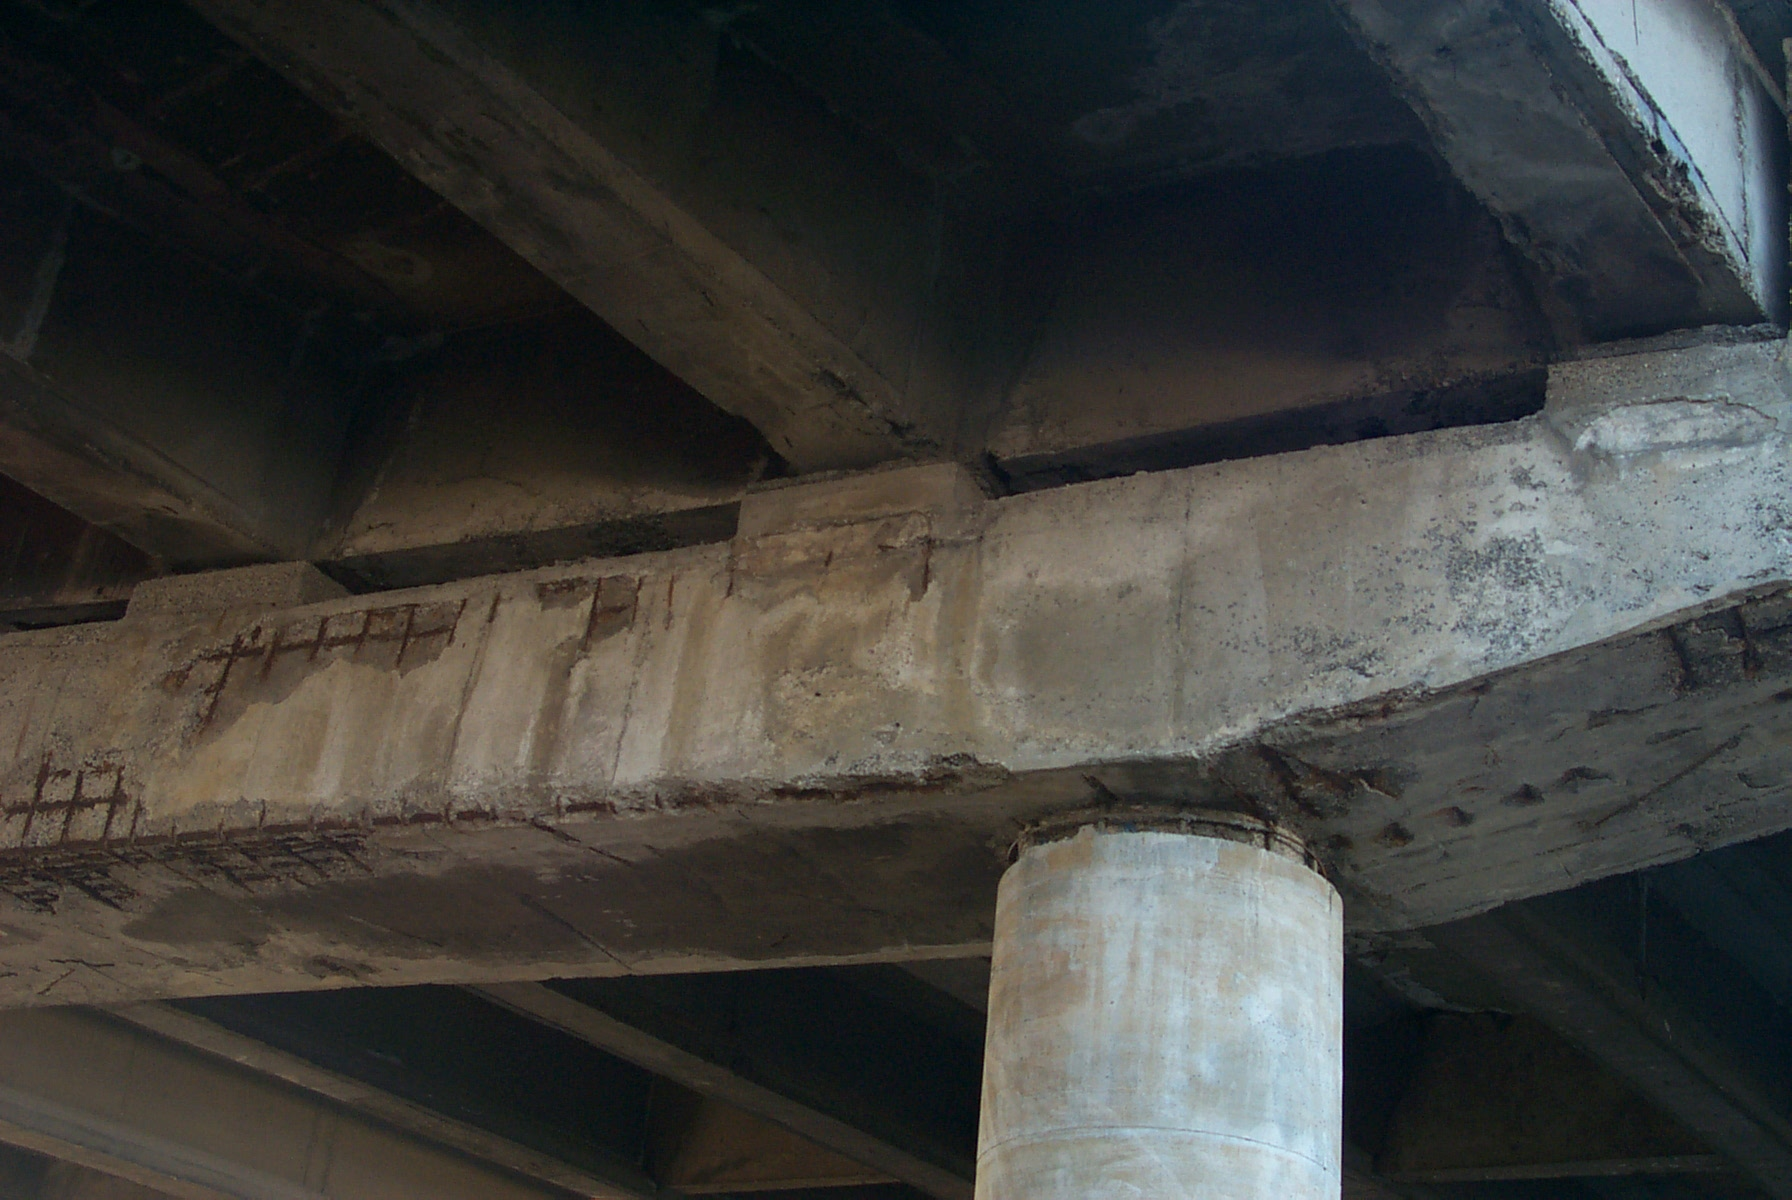 Reparatii pasaje km 11 si 13 pe A1 MAPEI - Poza 5